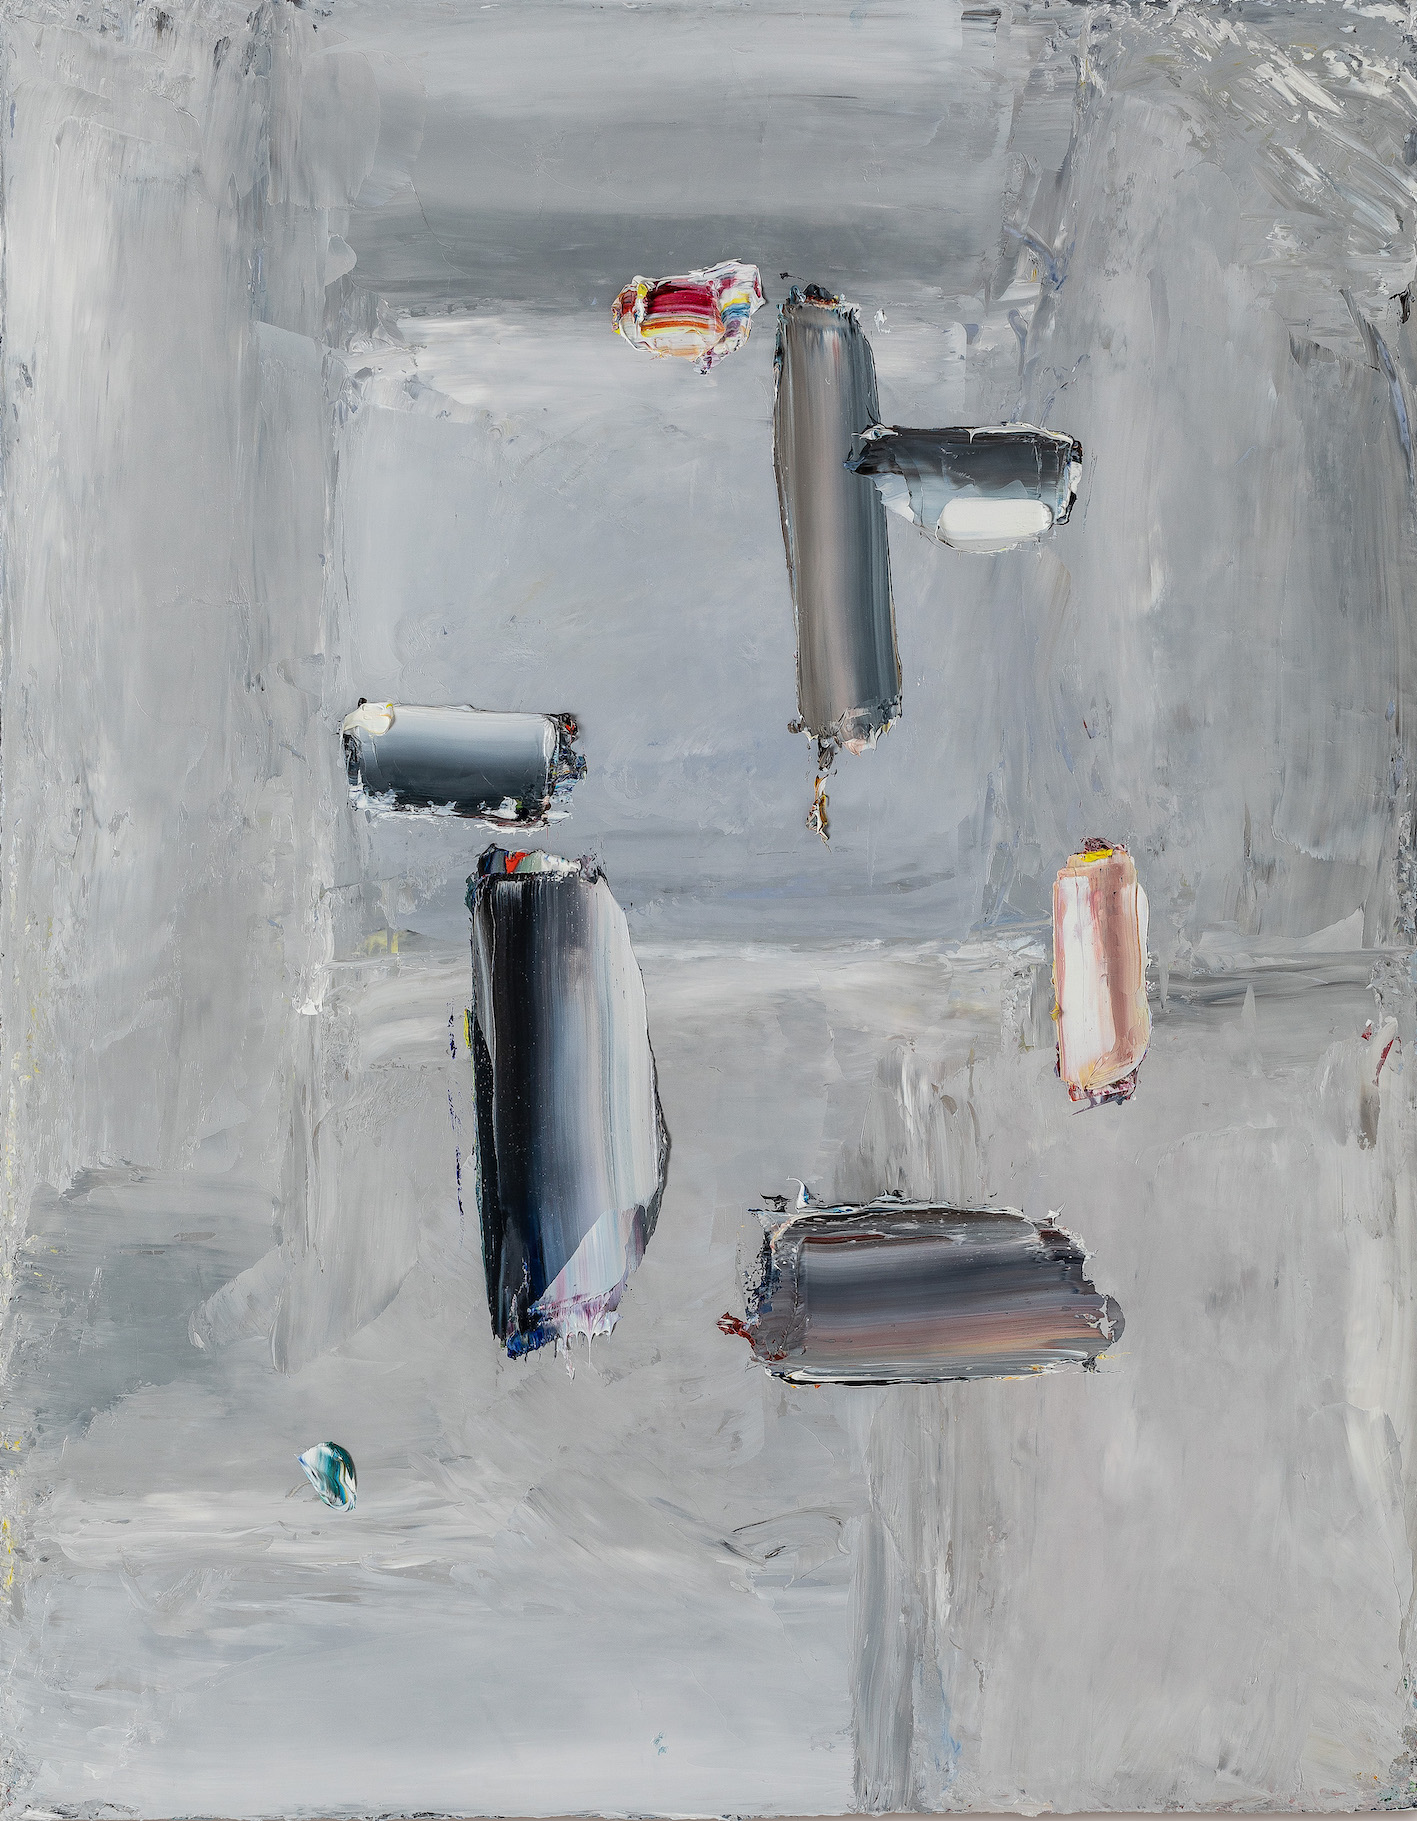 2019 Oil on Linen 51 x 40 in (129.5 x 101.6 cm) - Marc Straus Gallery